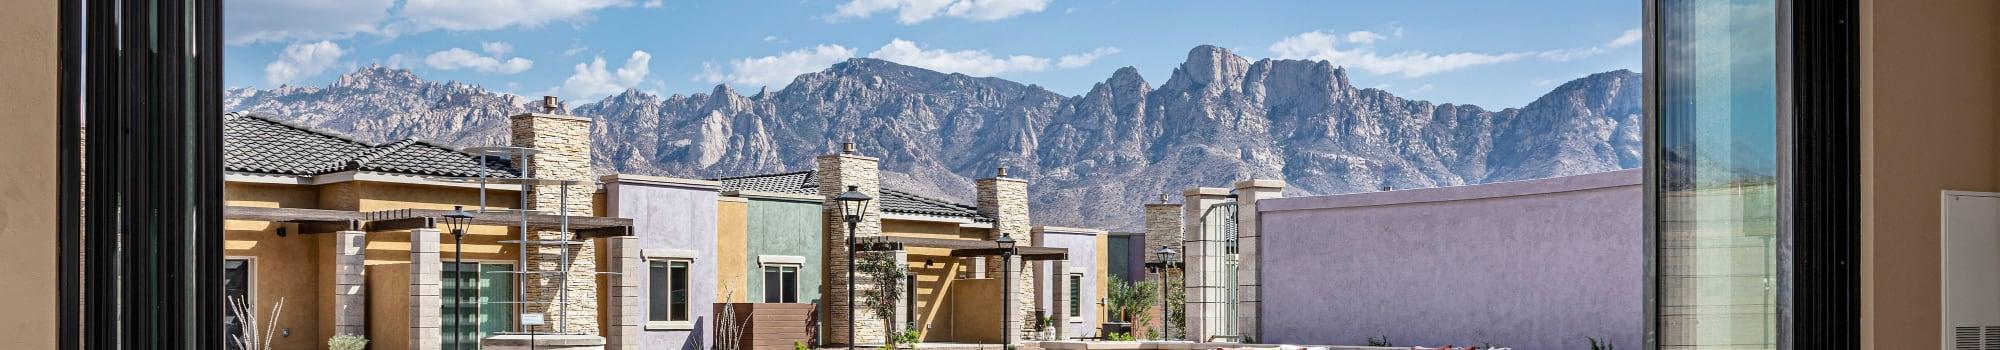 Photos at All Seasons Oro Valley in Oro Valley, Arizona